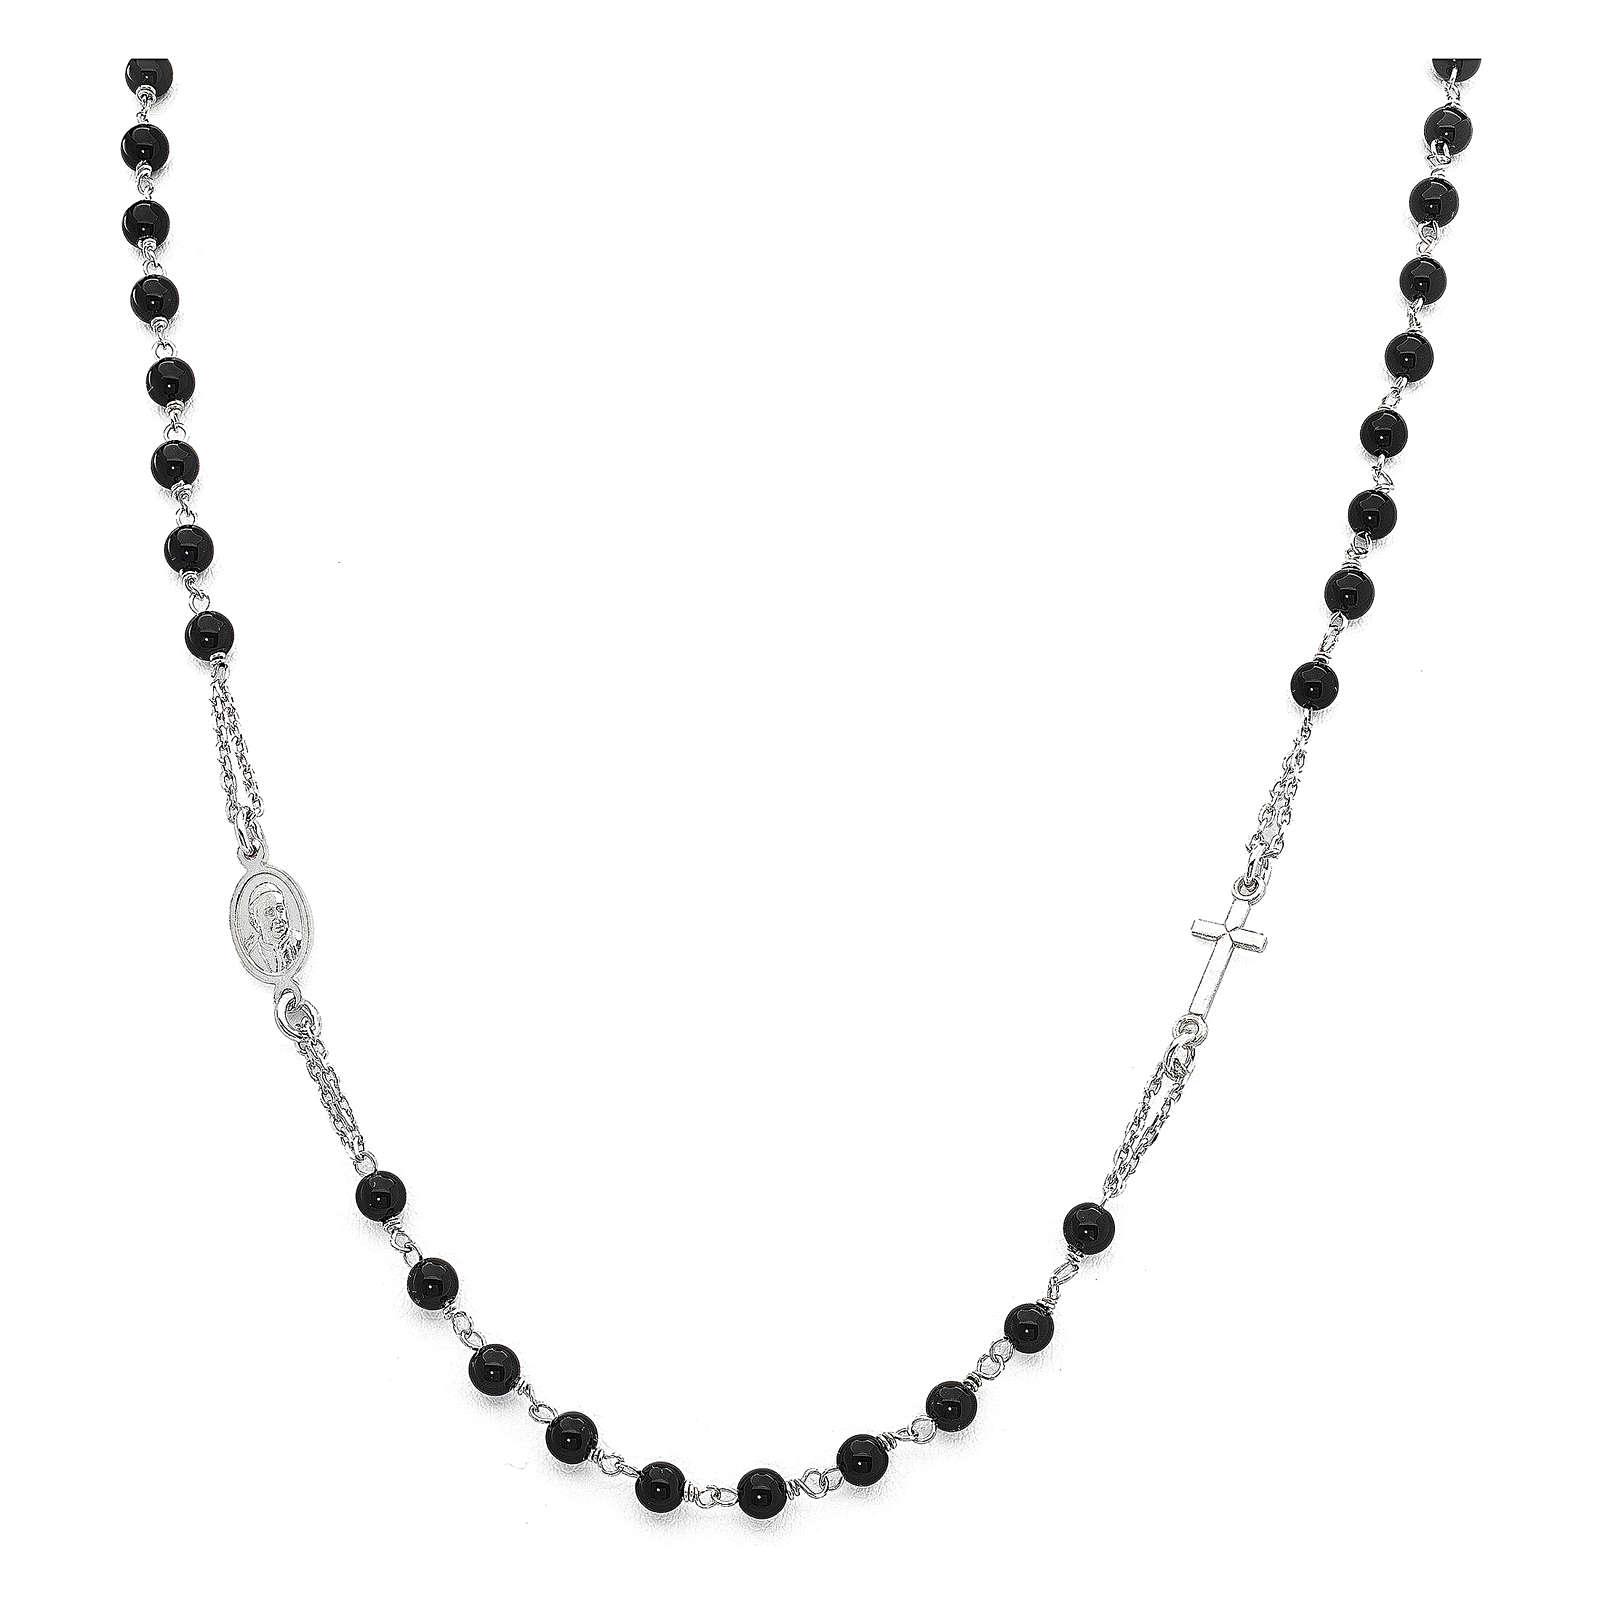 Rosary AMEN Necklace black crystals silver 925, Rhodium finish 4